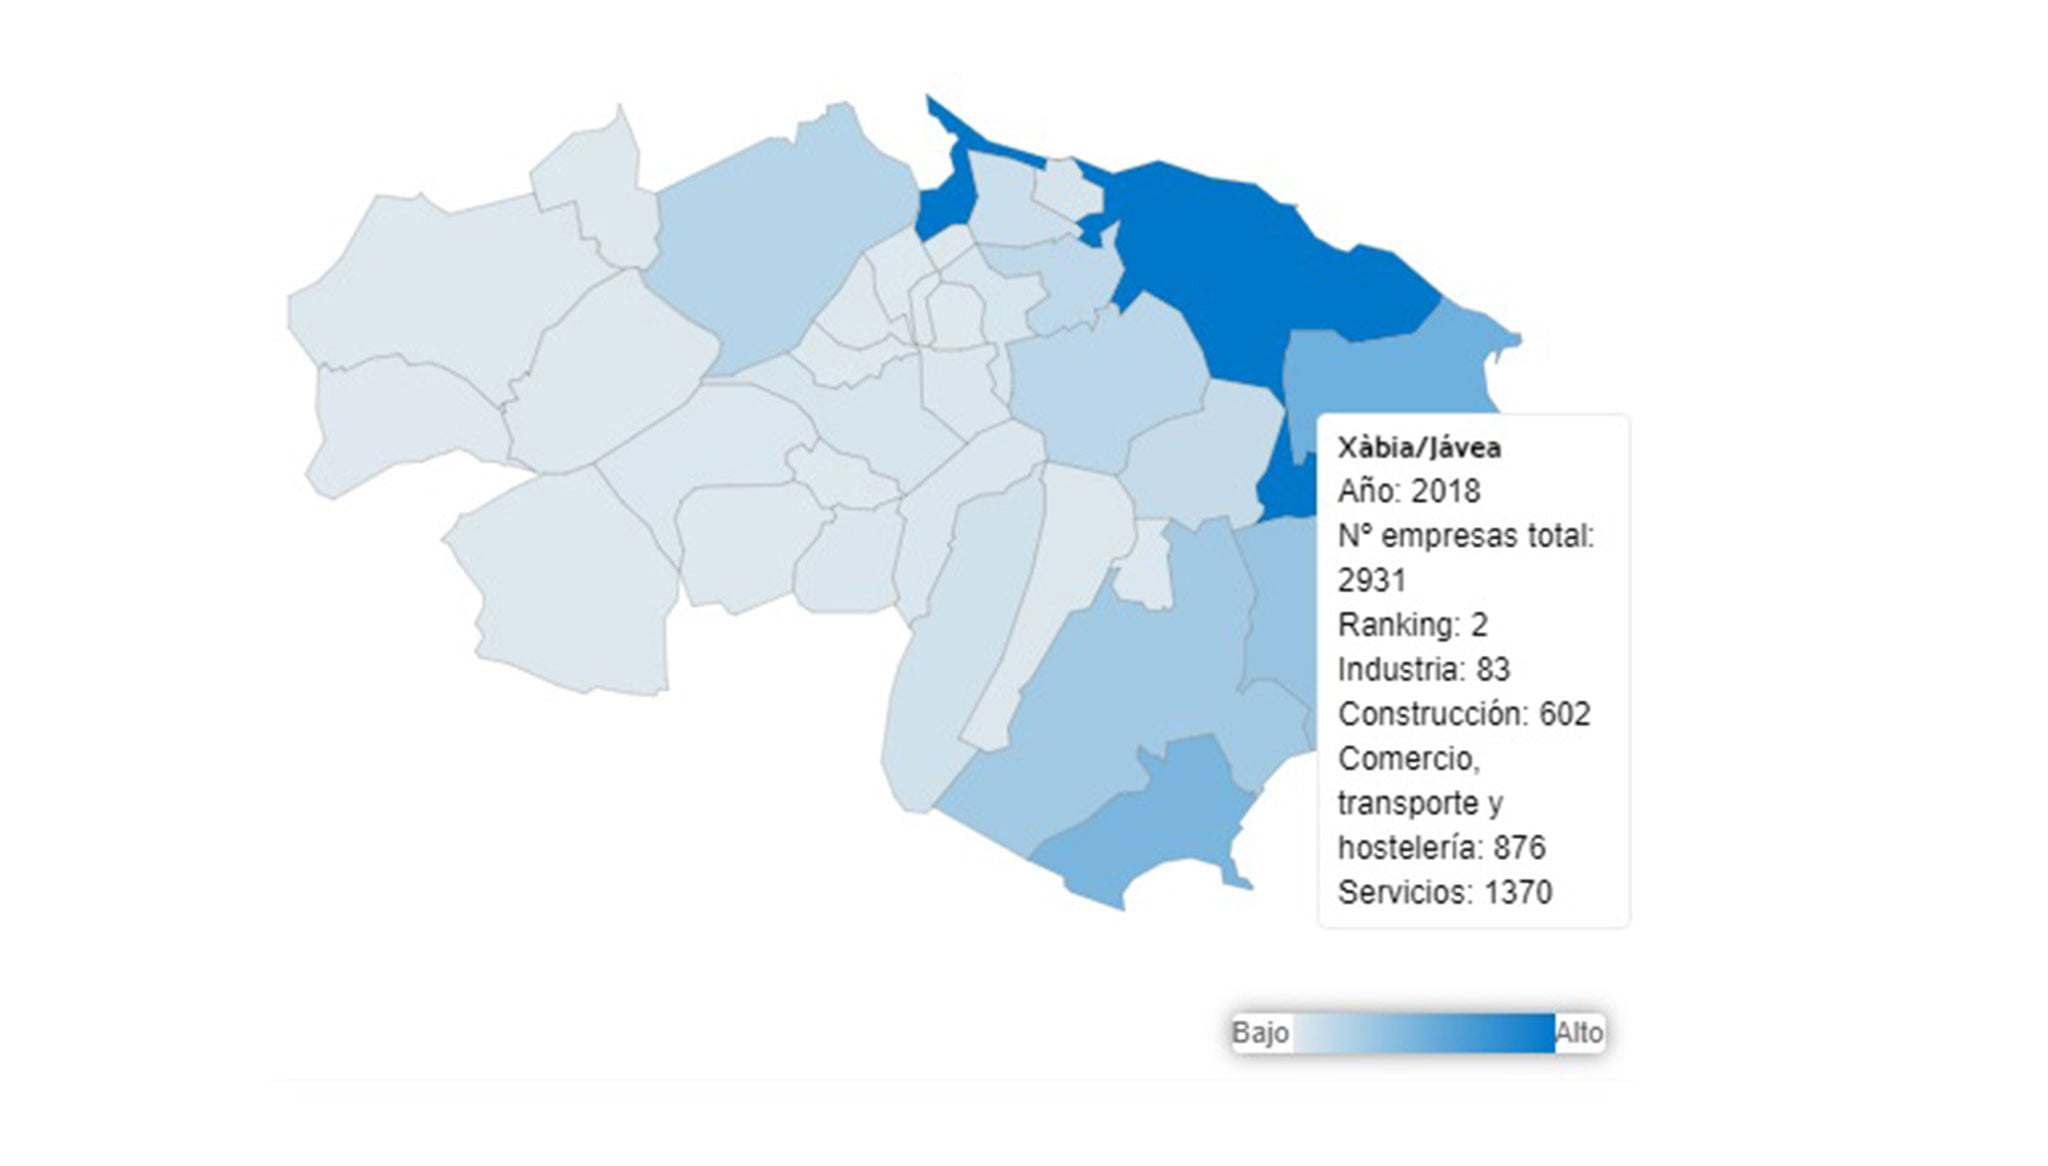 Número de empresas en Jávea en 2018, datos extraídos de l'Observatori